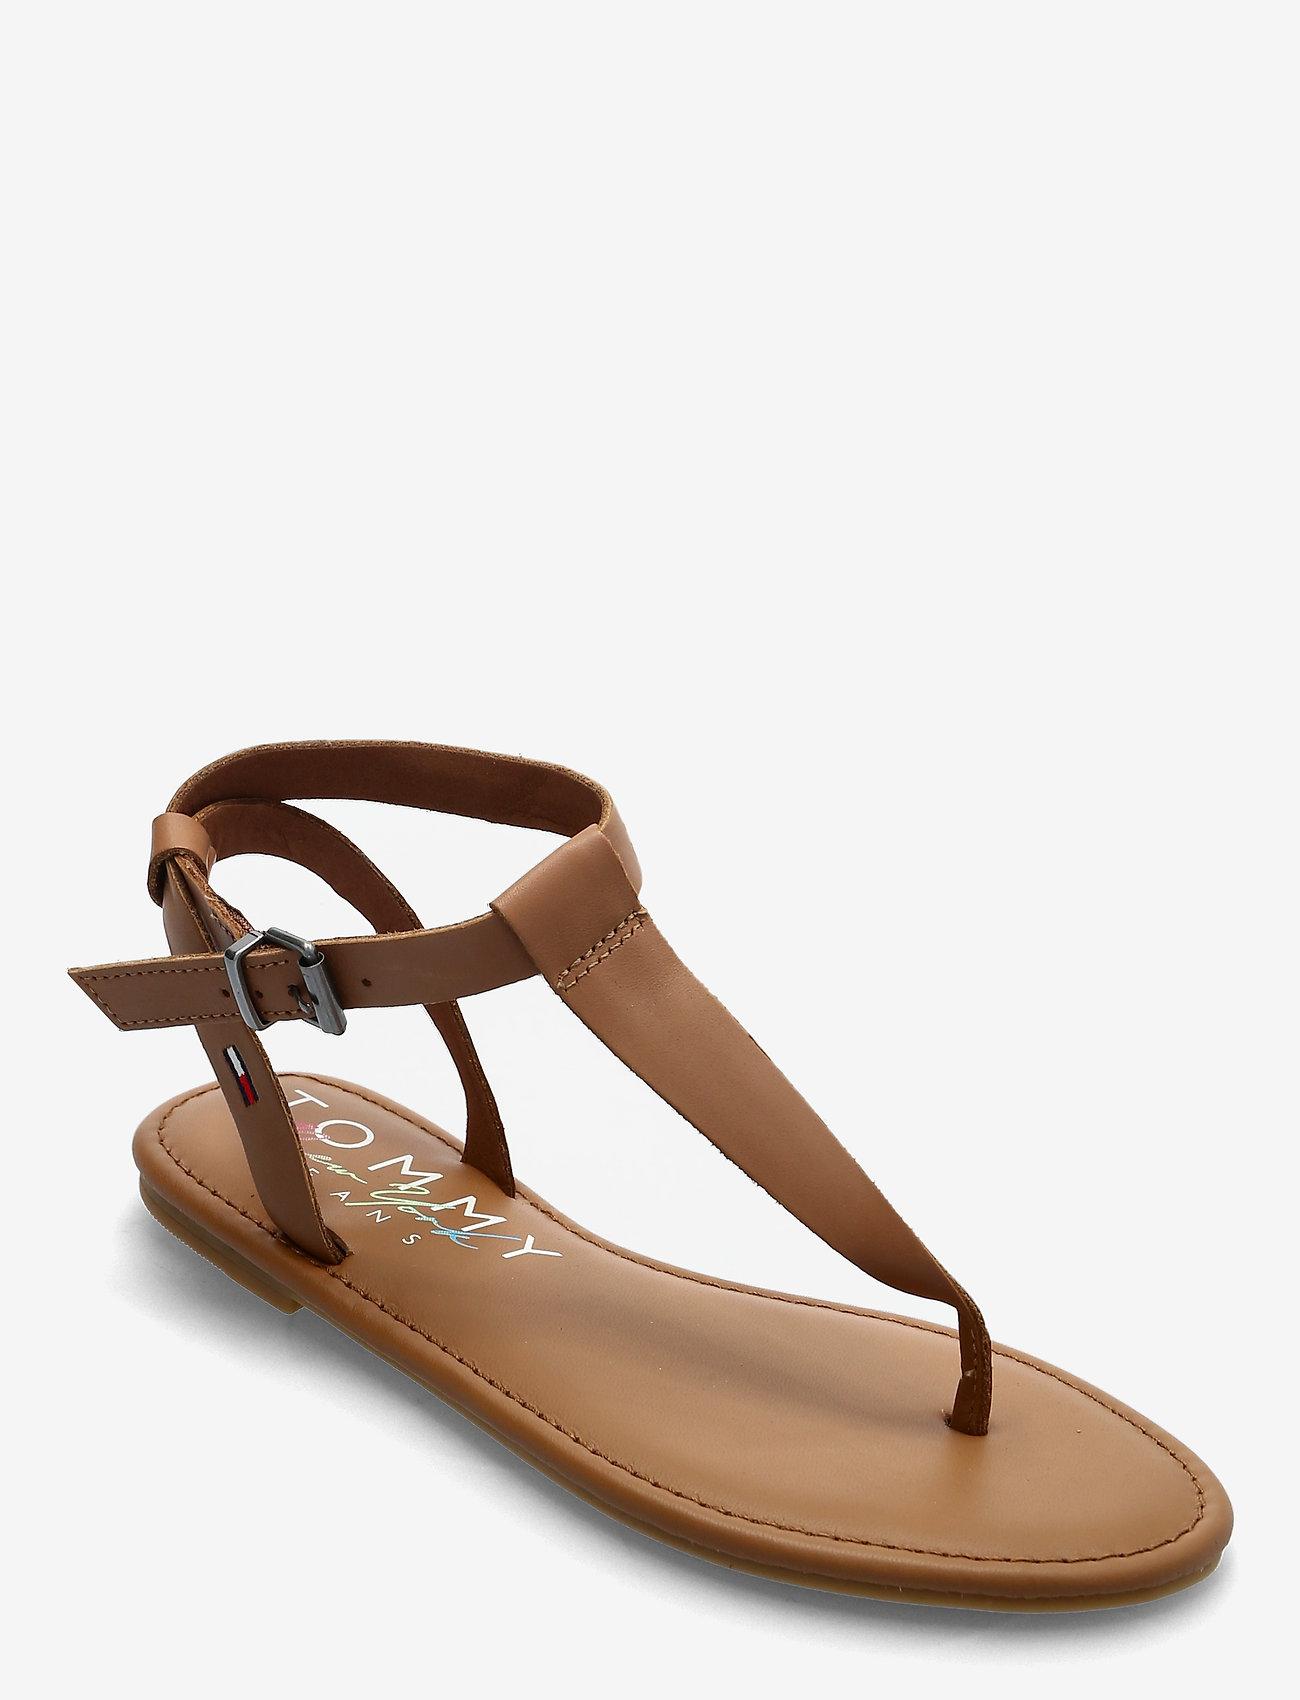 Tommy Hilfiger - ESSENTIAL TOE POST FLAT SANDAL - flat sandals - summer cognac - 0